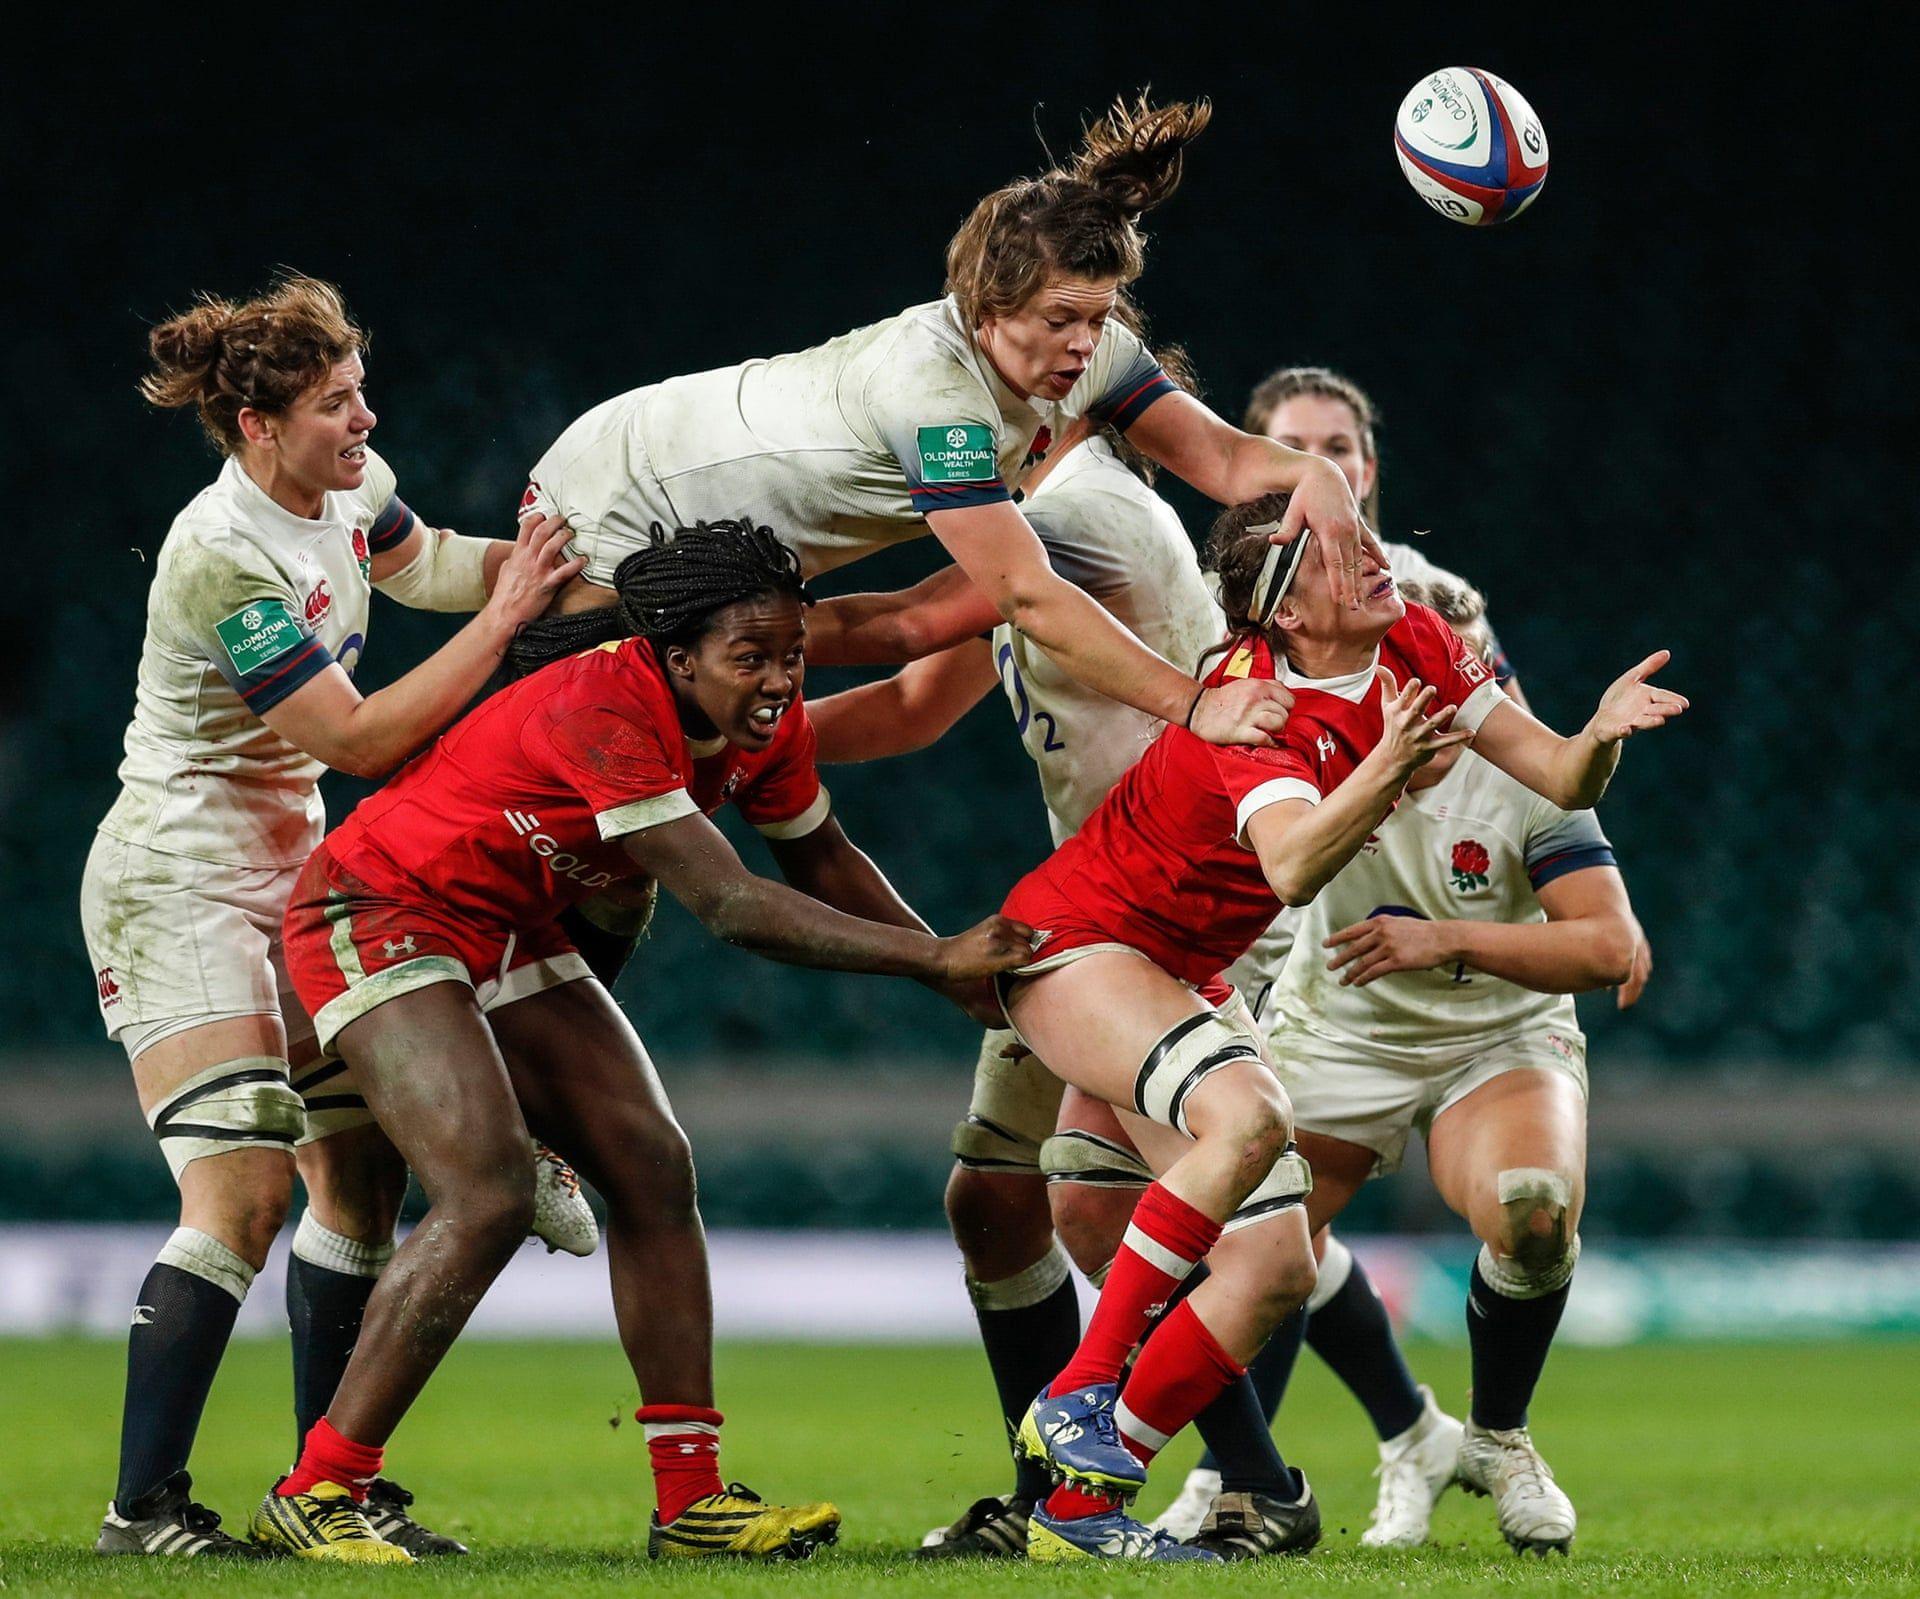 Pillanat az Anglia Kanada női rögbi mérklőzésről a Twickenham stadionból. Fotó: Eddie Keogh / Reuters / thebppa